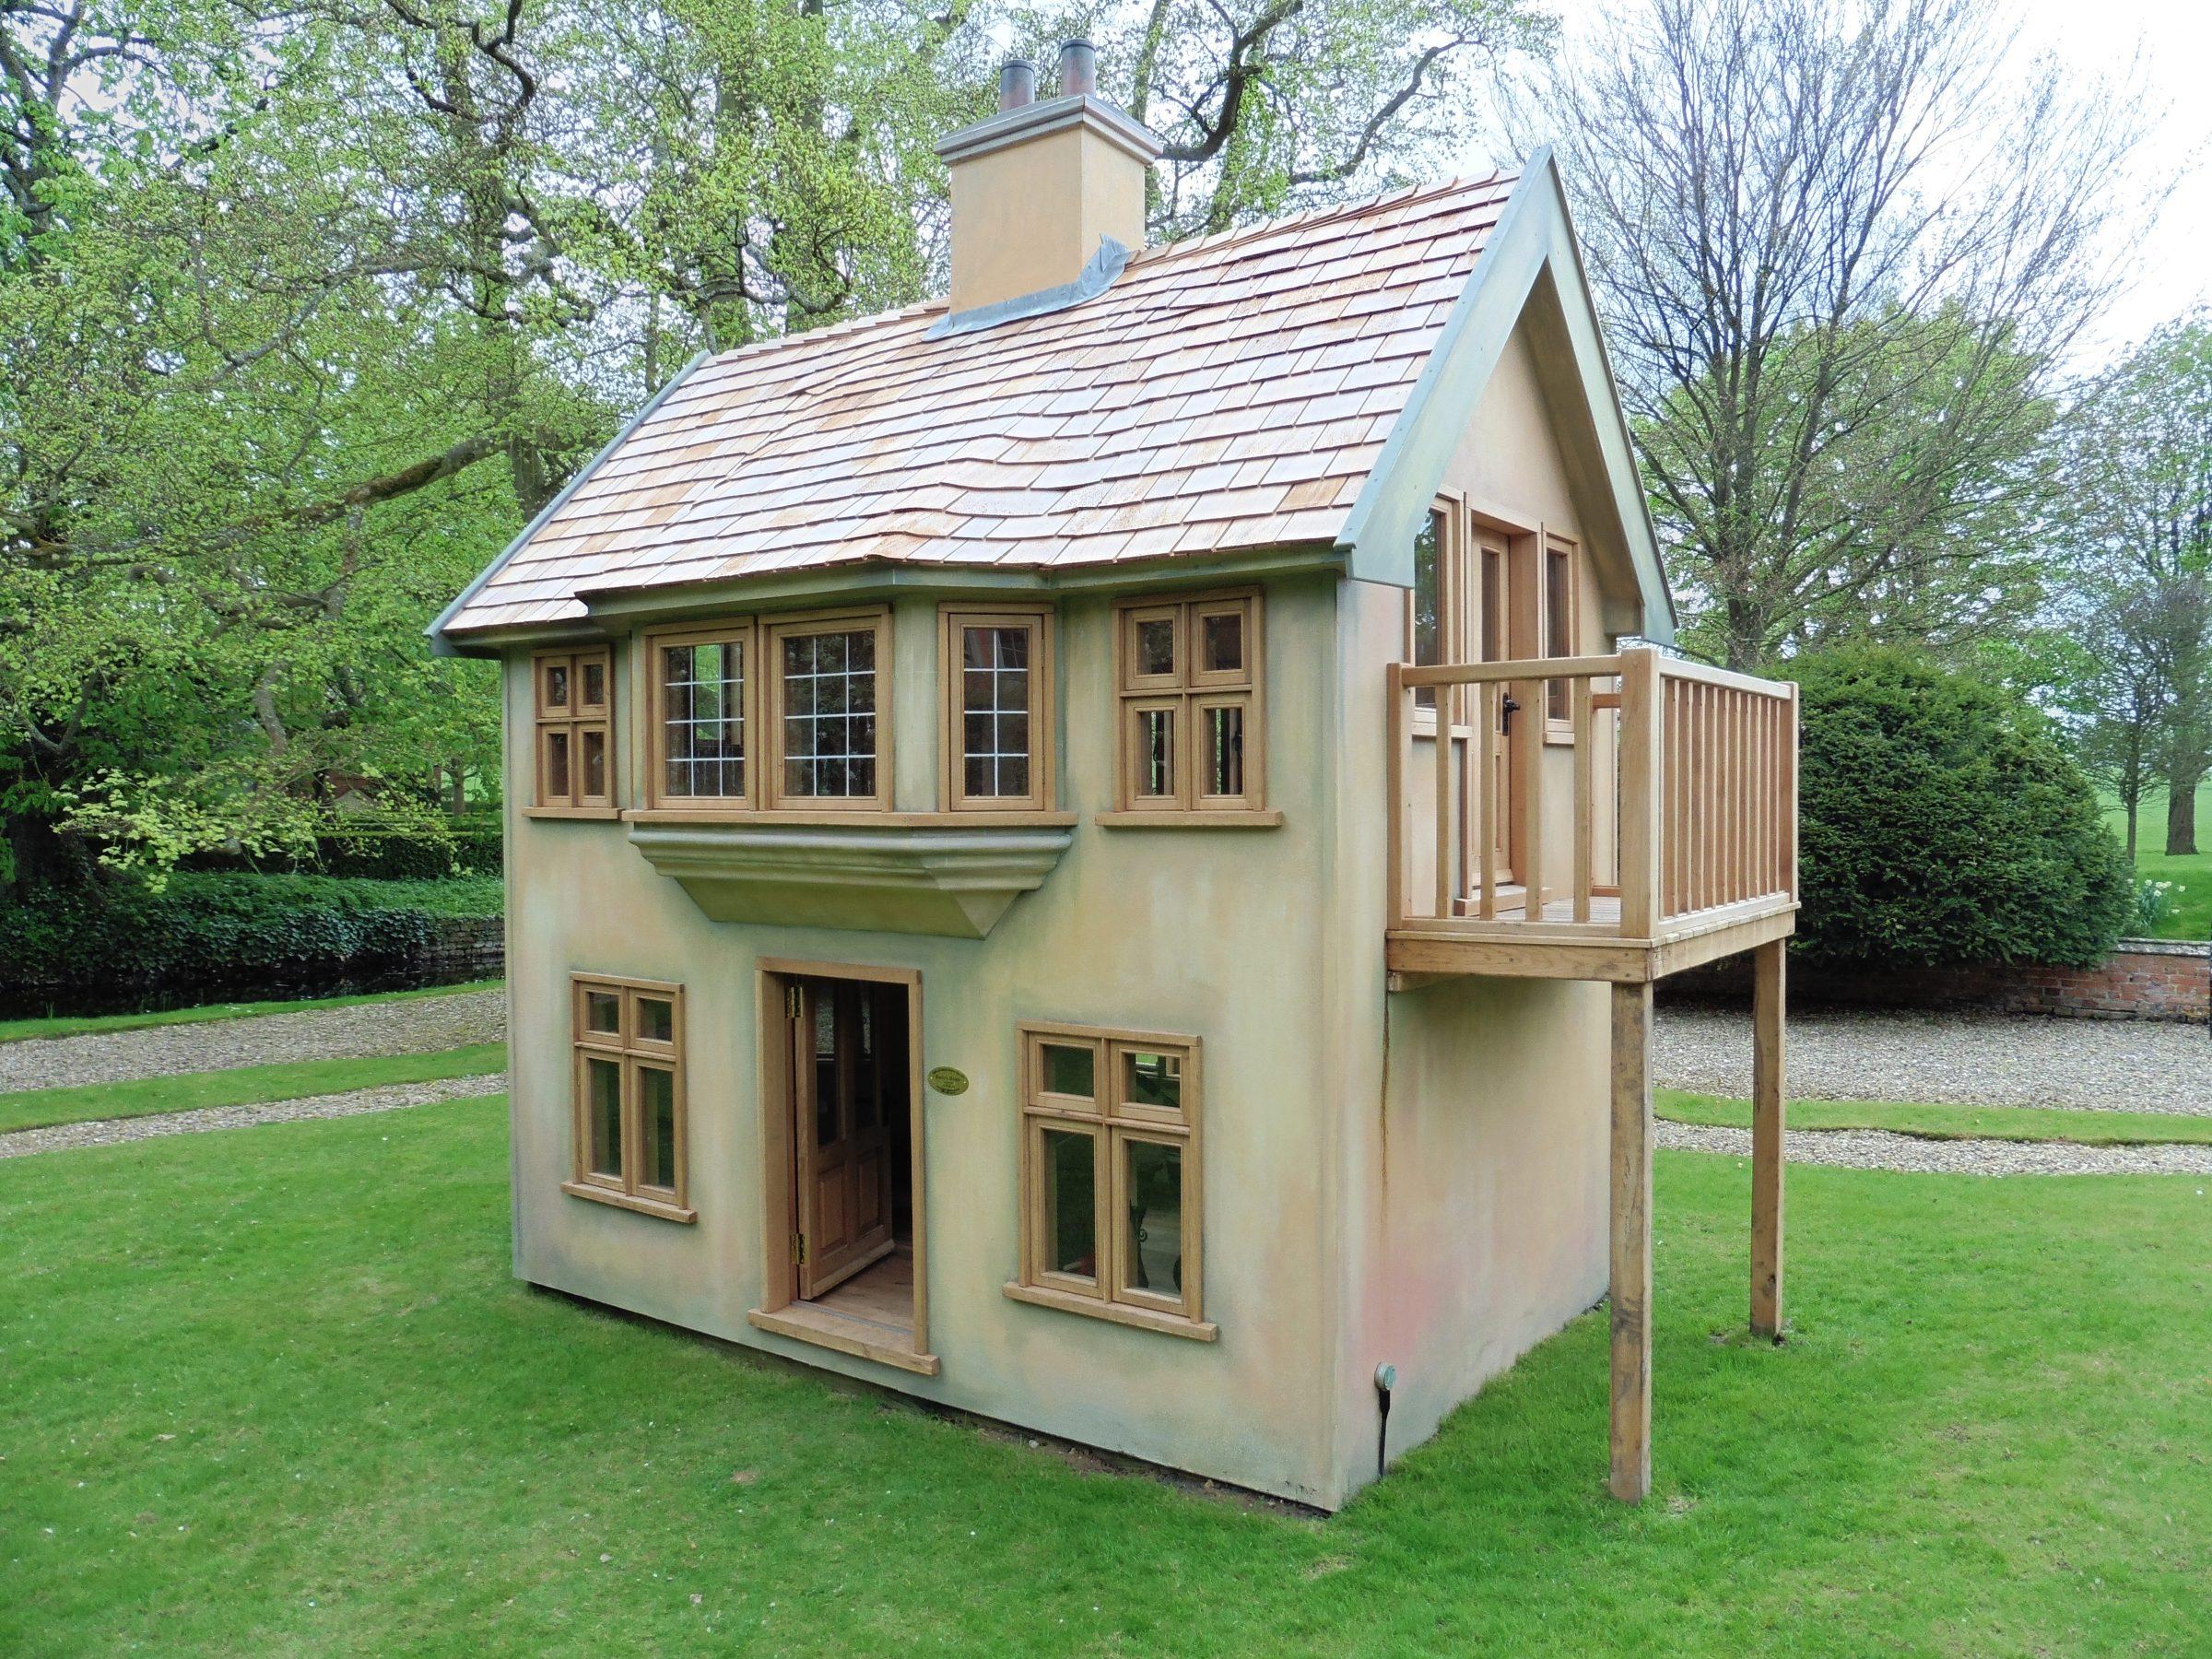 Bespoke Childrens Playhouses Wendy Houses Flights Of Fantasy